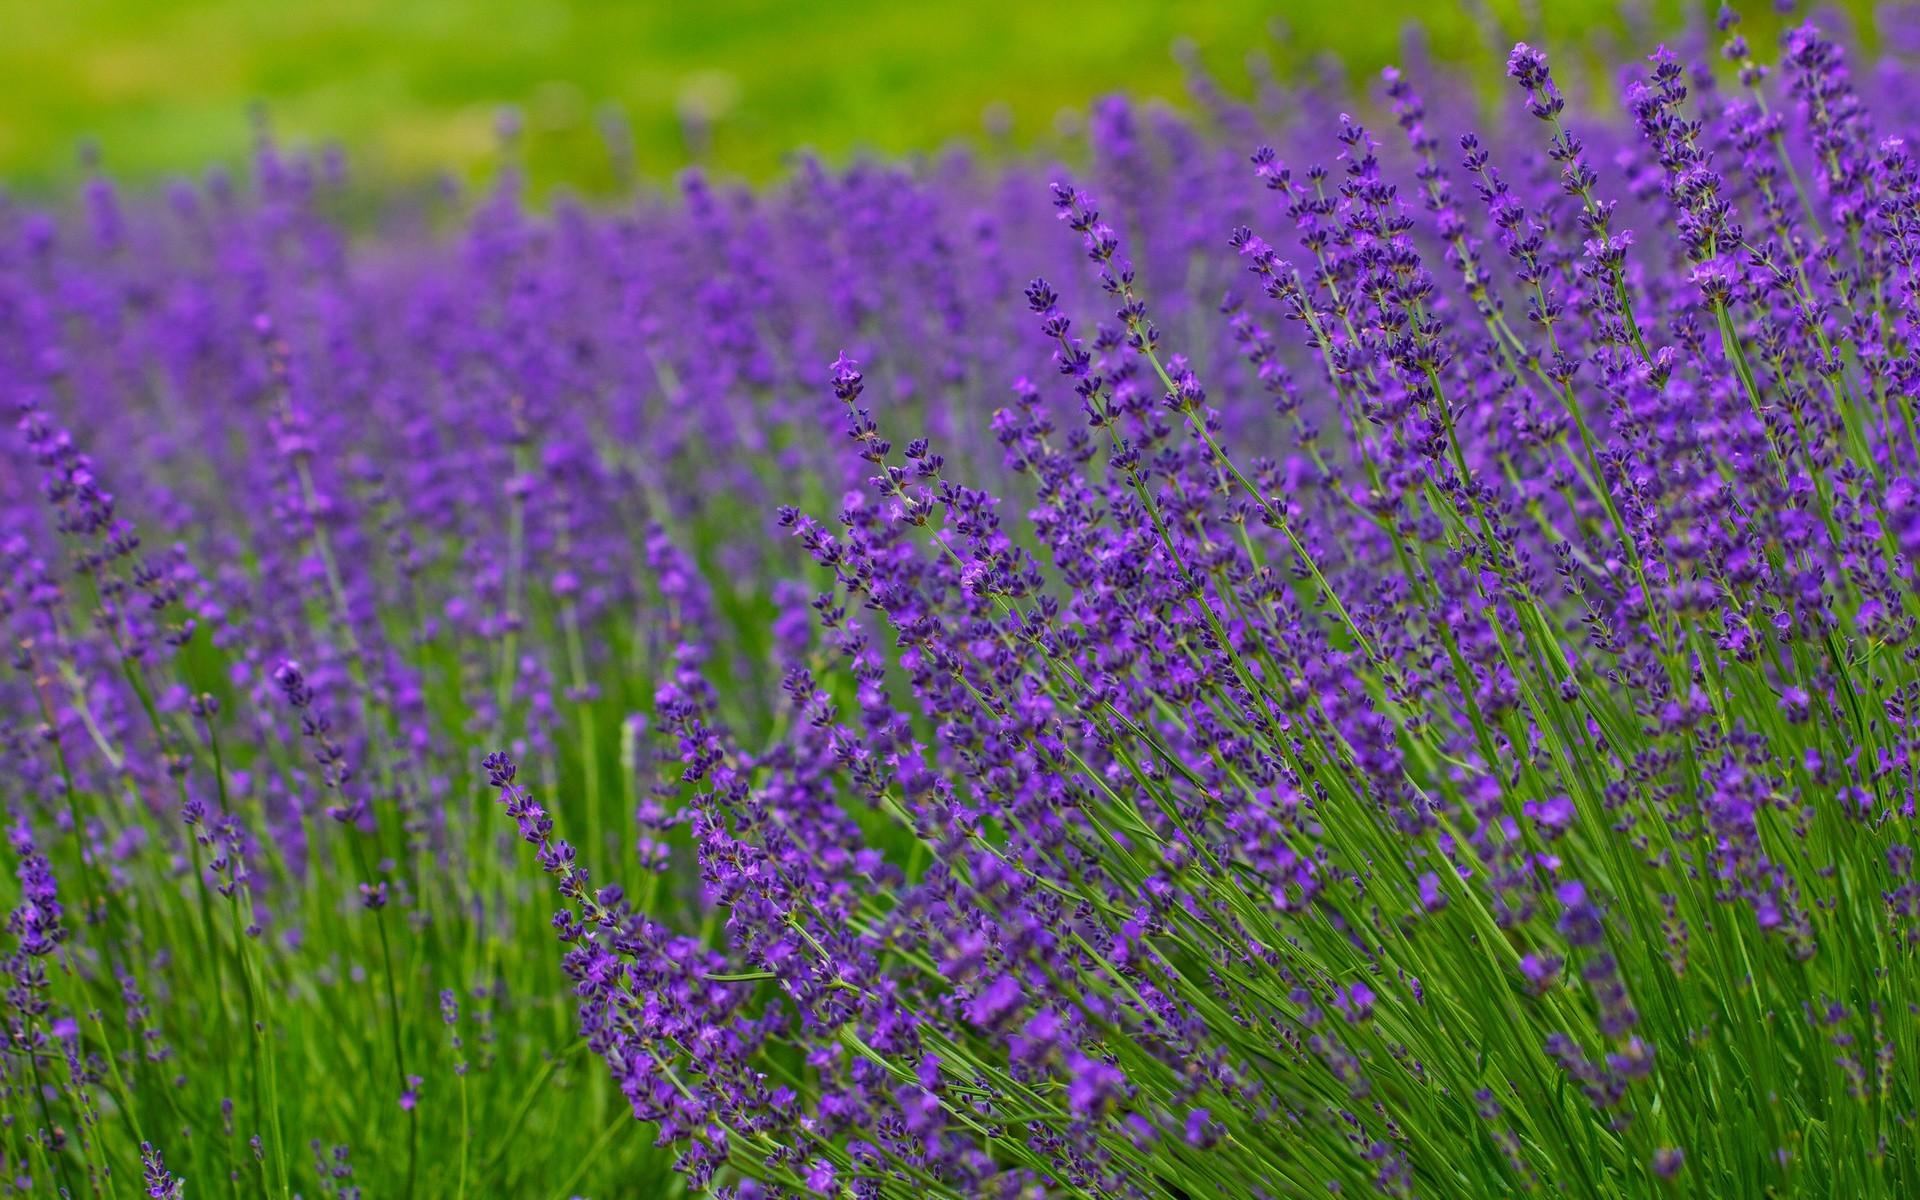 Lavender field hd wallpaper background HD Wallpapers